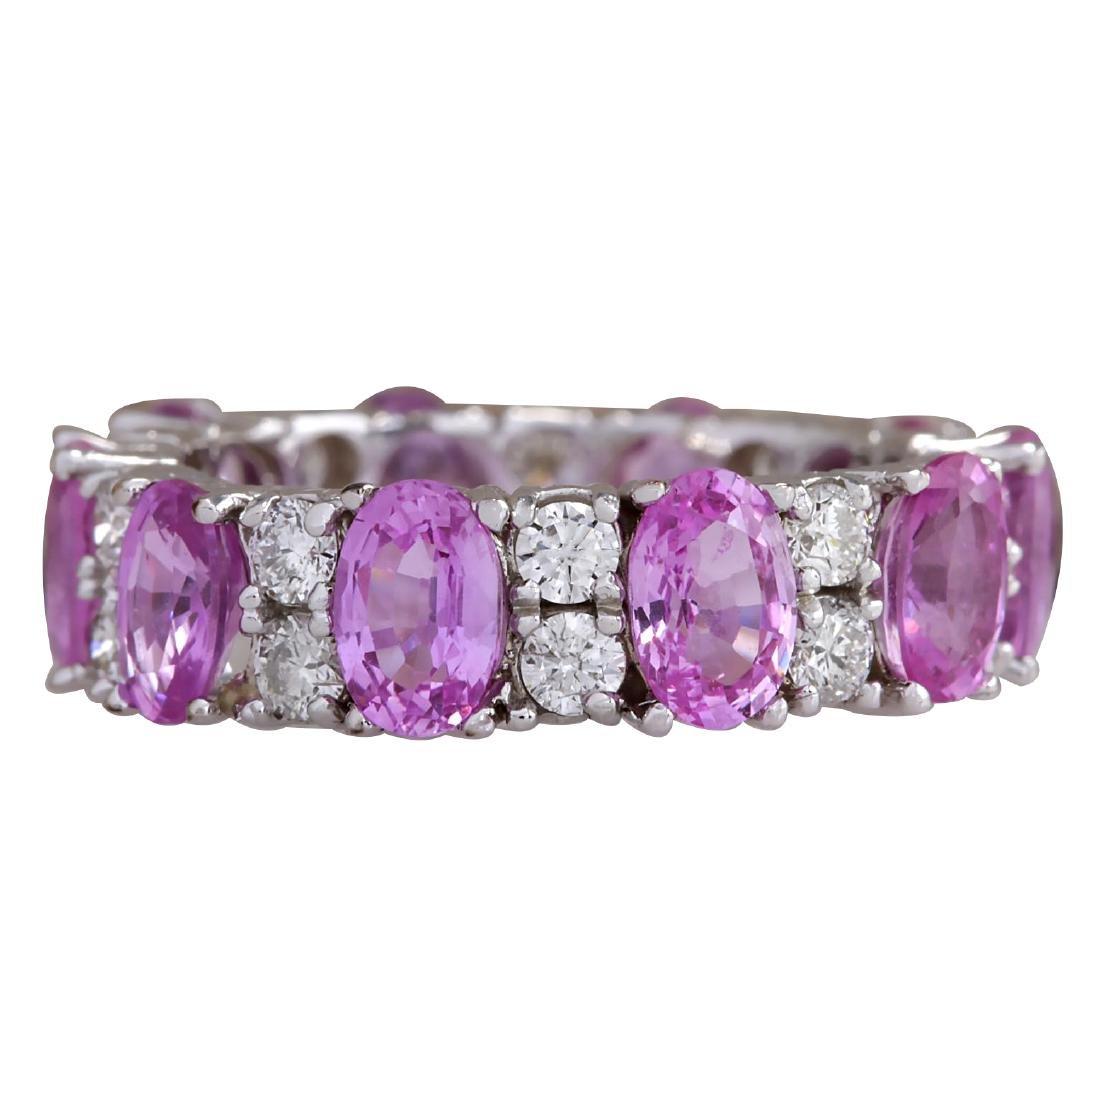 7.71CTW Natural Pink Ceylon Sapphire Diamond Ring 18K